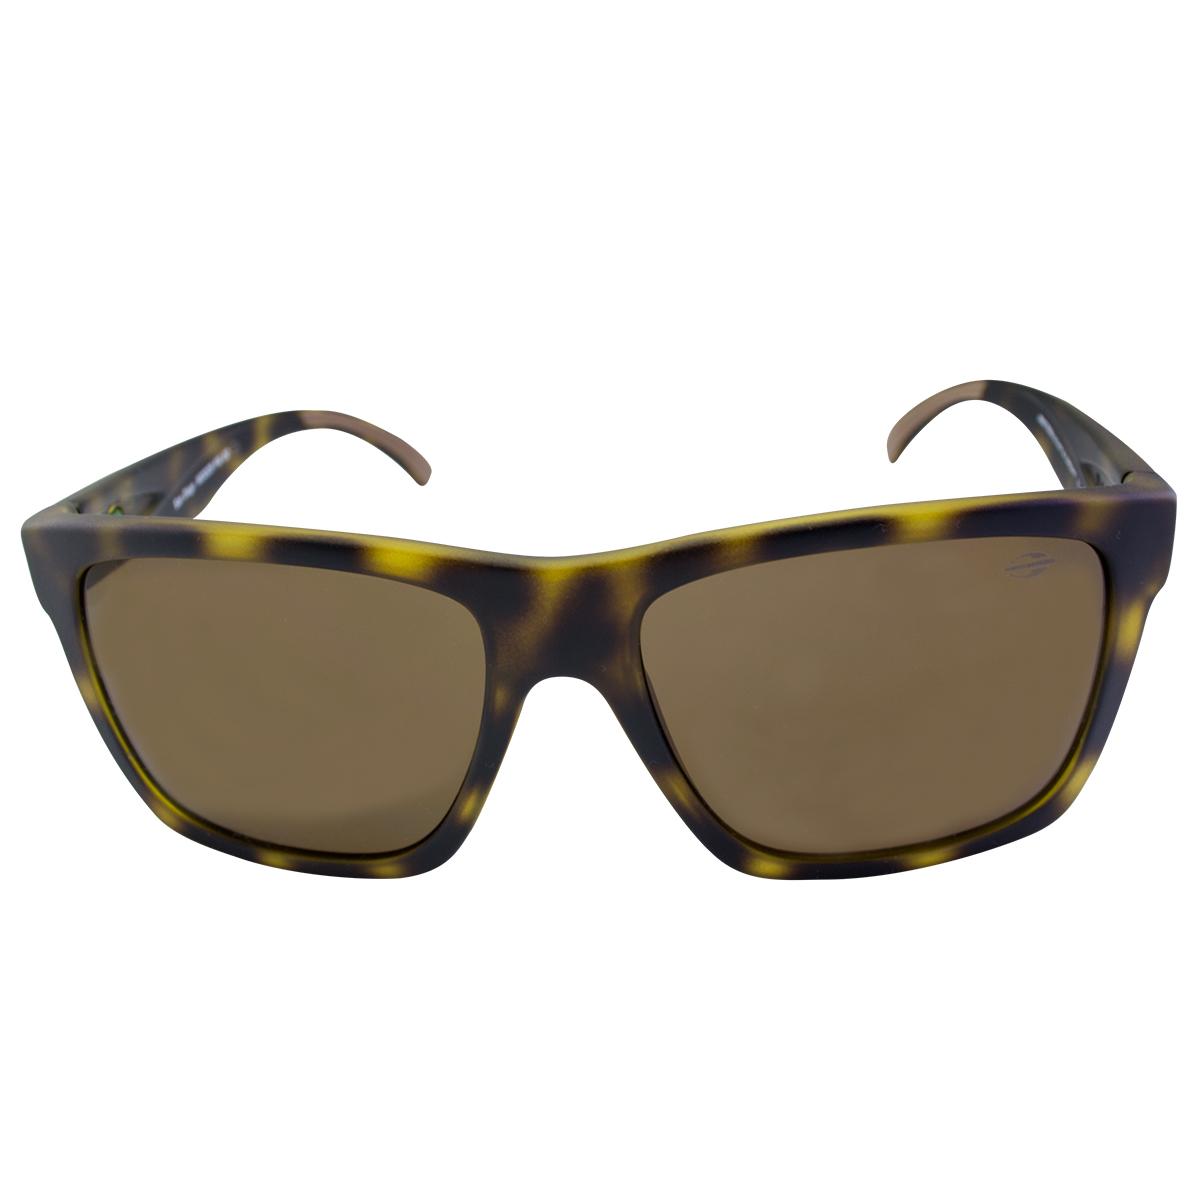 Óculos Mormaii San Diego Marrom Tortoise Lente Marrom ref M0009F1602 aa02806227